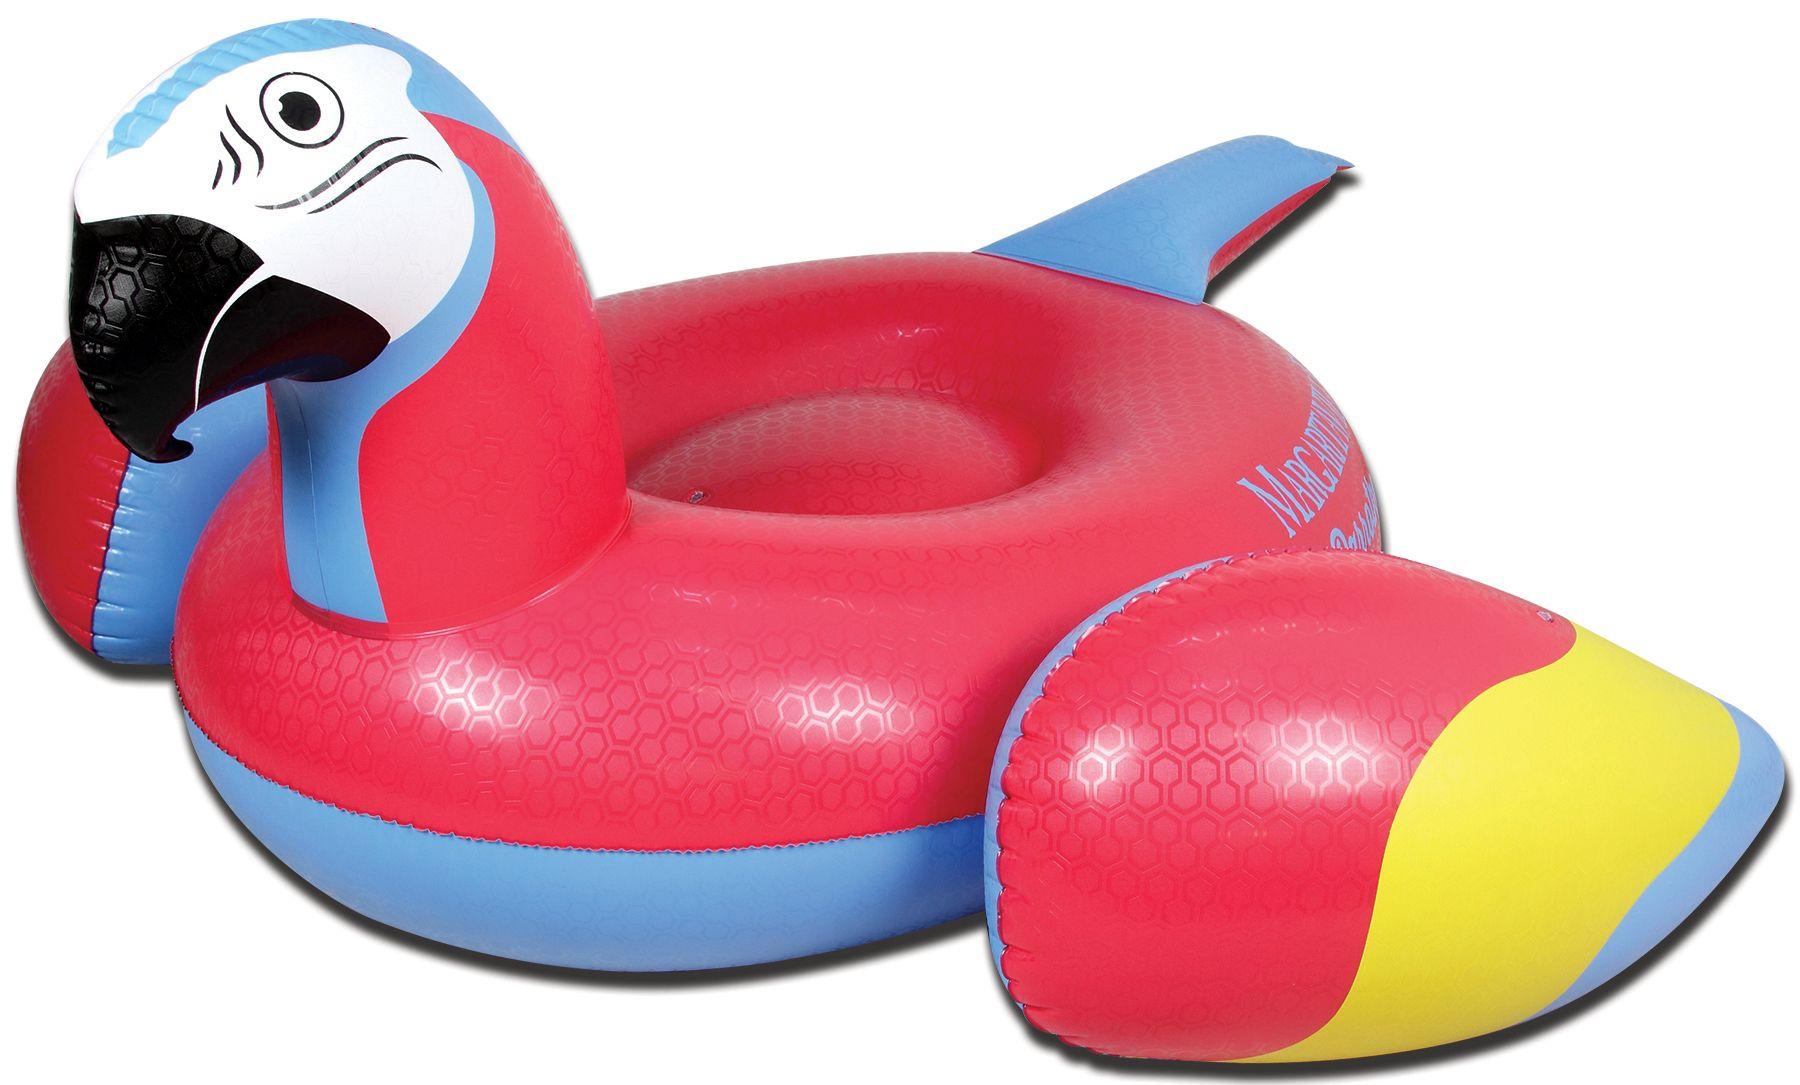 River Tubes Pool Floats DICKS Sporting Goods